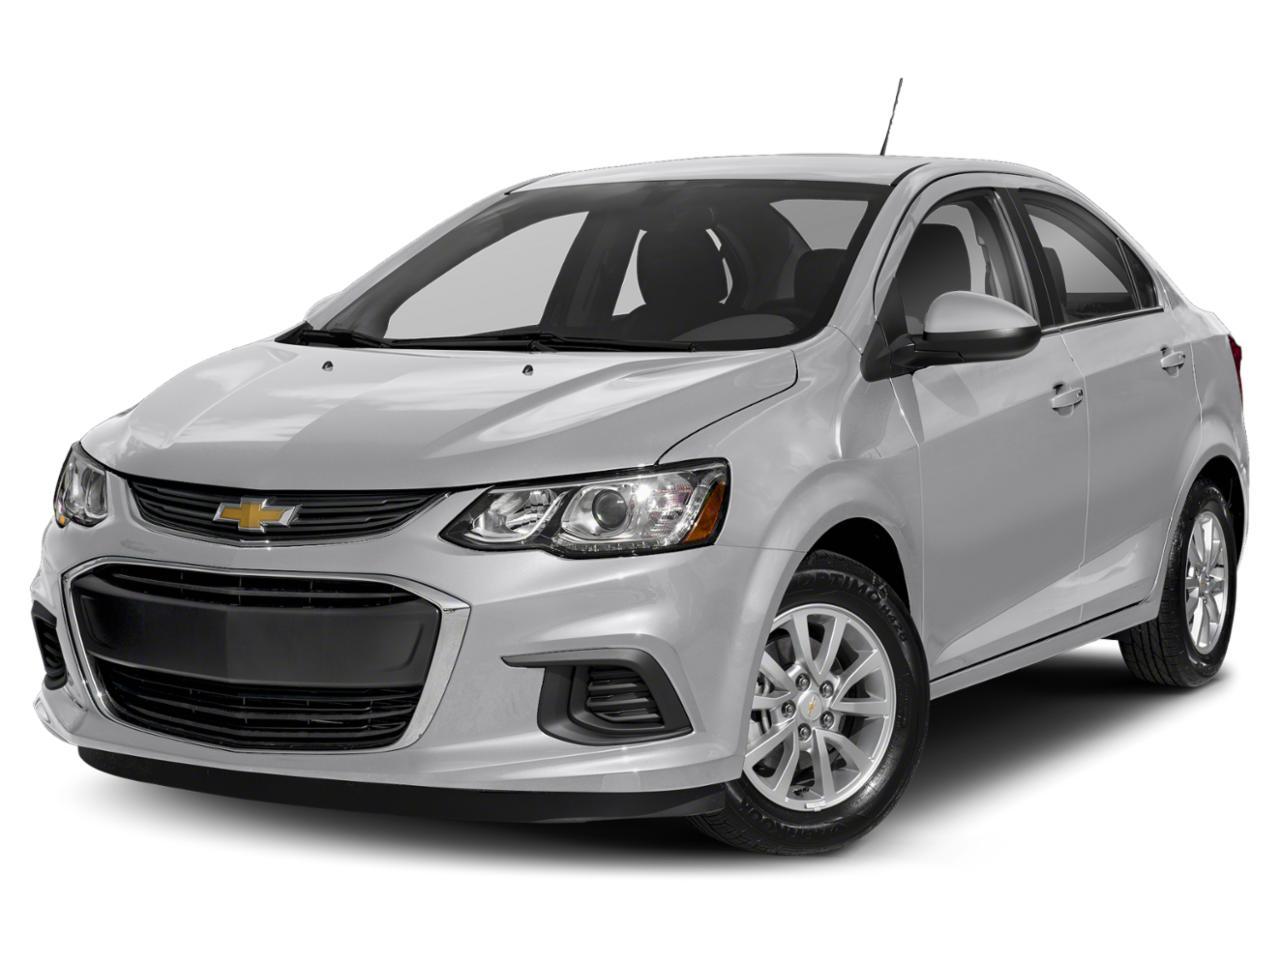 2020 Chevrolet Sonic Vehicle Photo in Selma, TX 78154